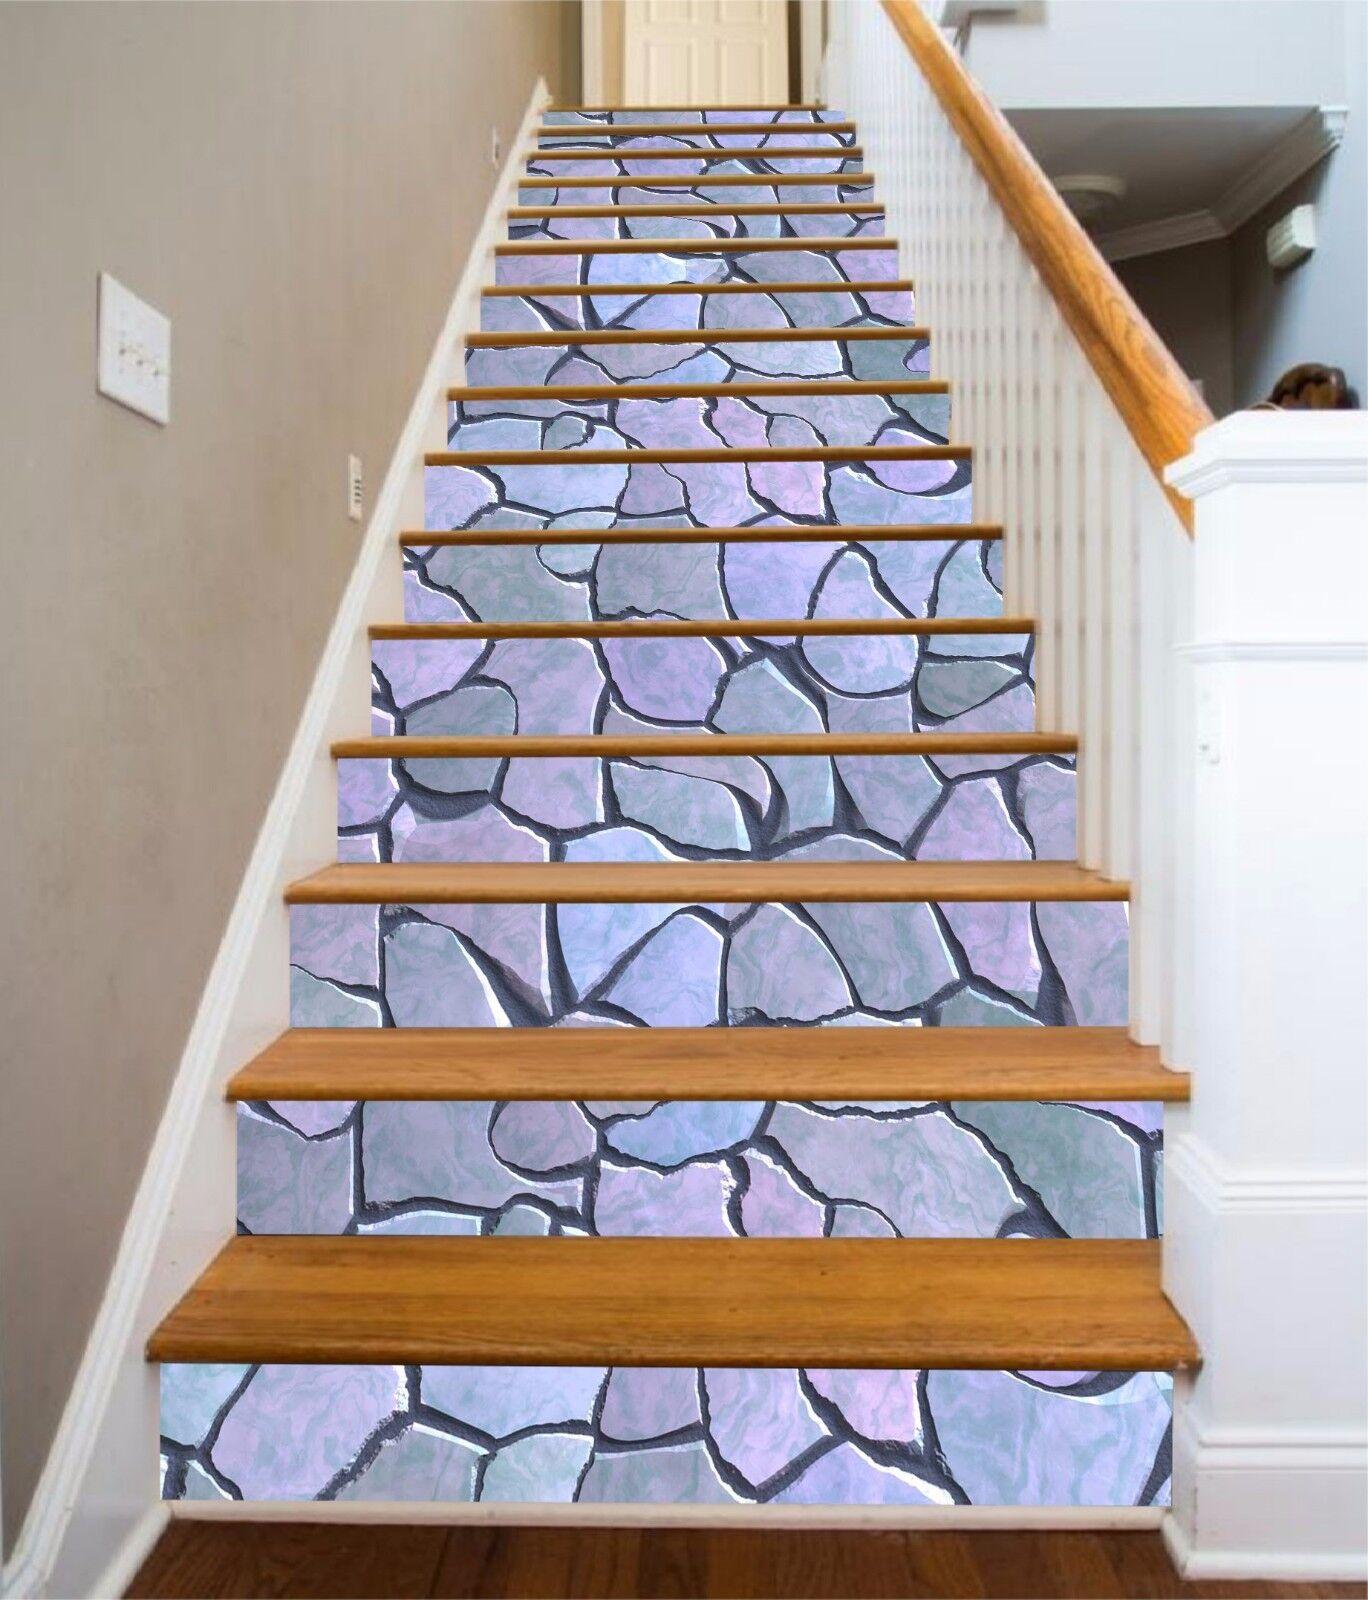 3D Stone  5054 Stair Risers Decoration Photo Mural Vinyl Decal Wallpaper AU